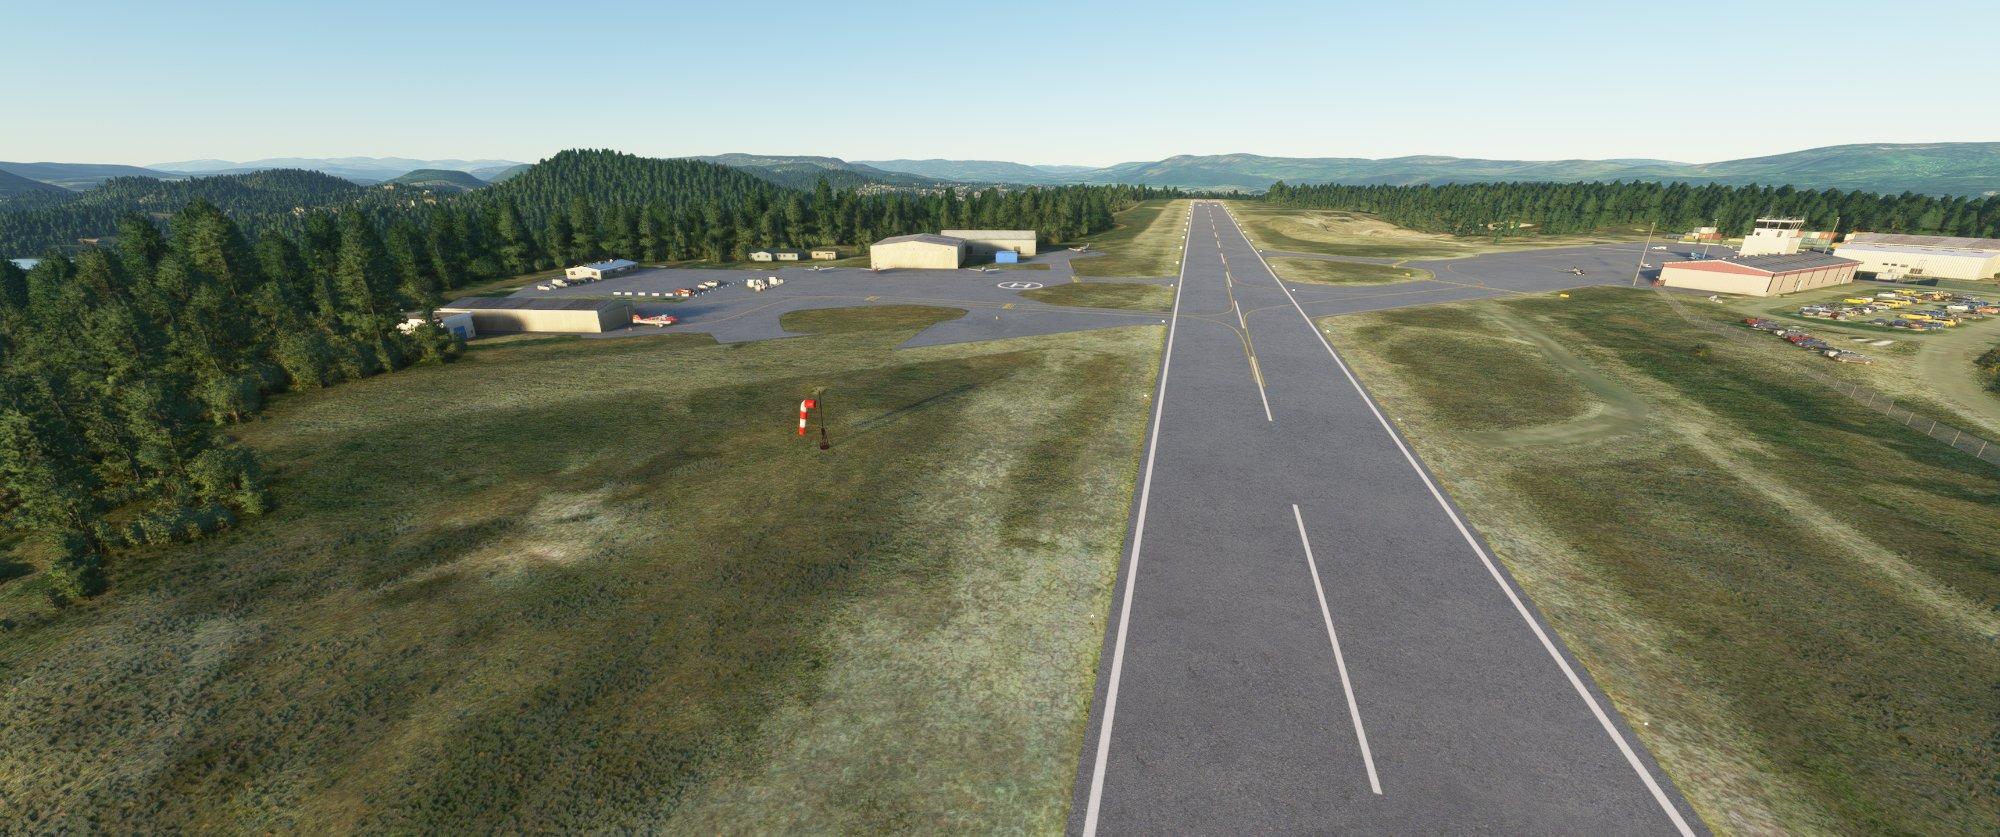 Microsoft Flight Simulator Screenshot 2020.11.12 - 15.05.34.36.jpg